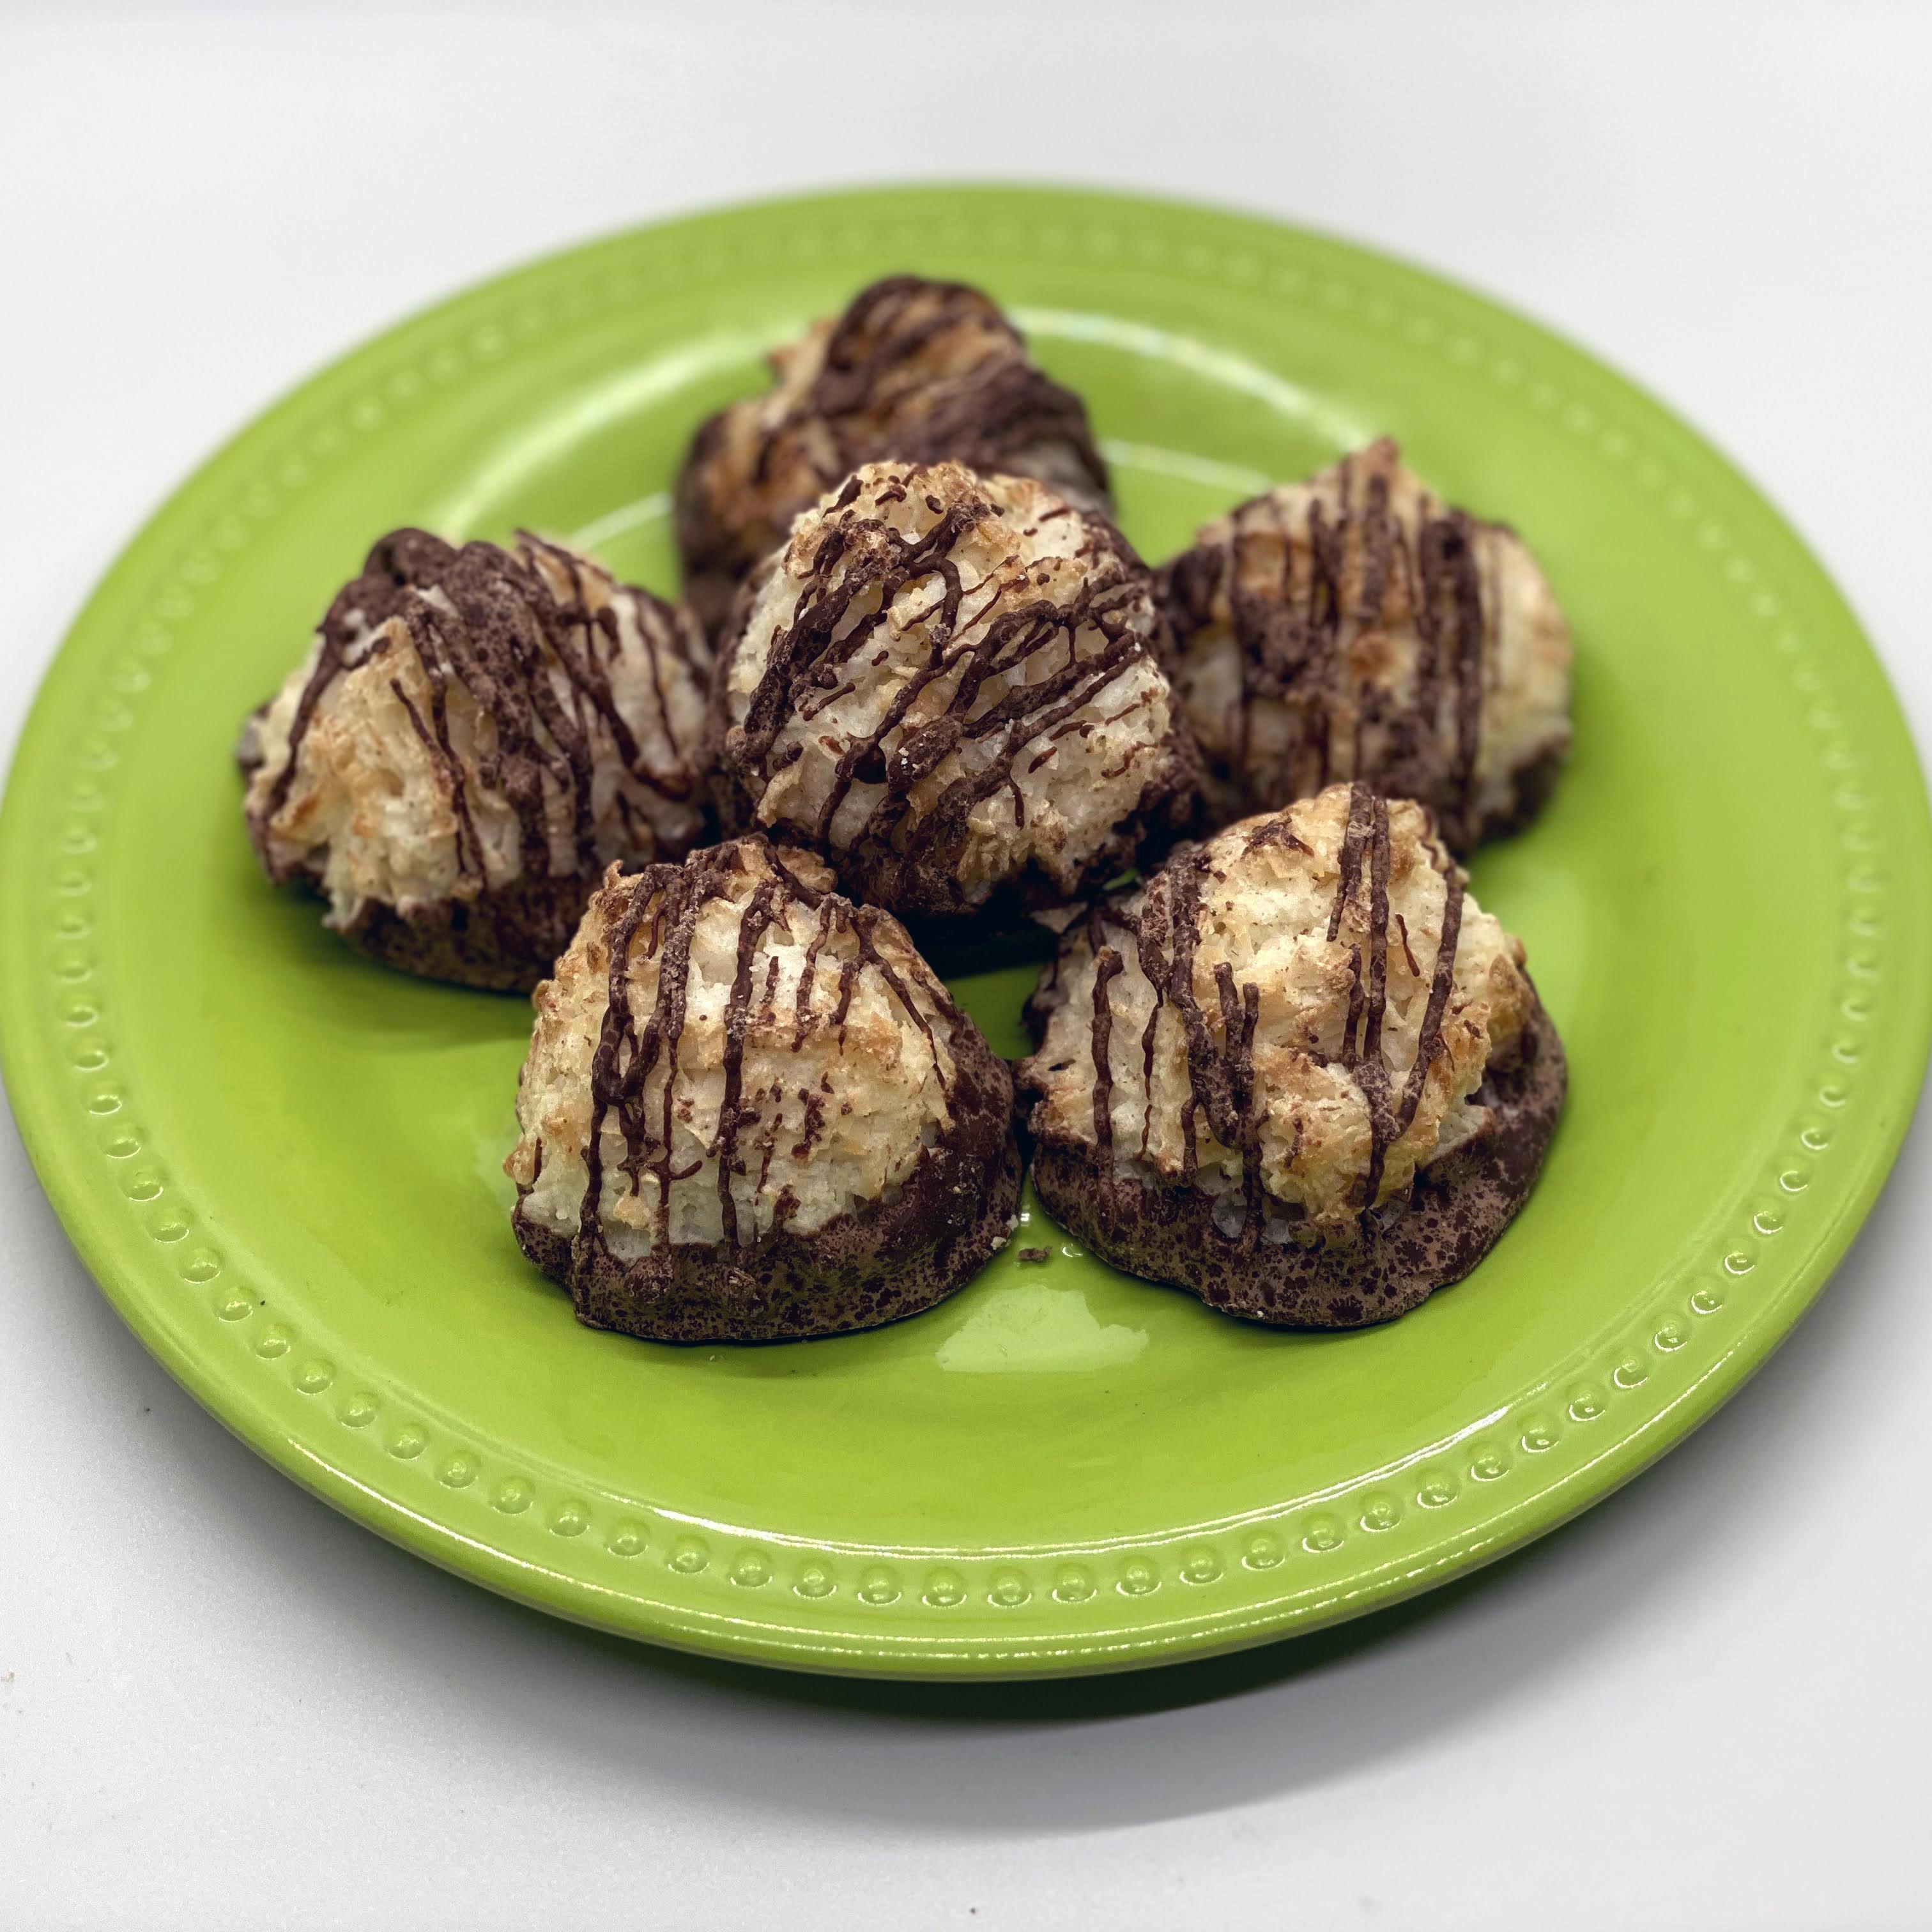 Gentle Barn Vegan Macaroons vegan dessert, cruelty free dessert, vegan macaroons, vegan cookies